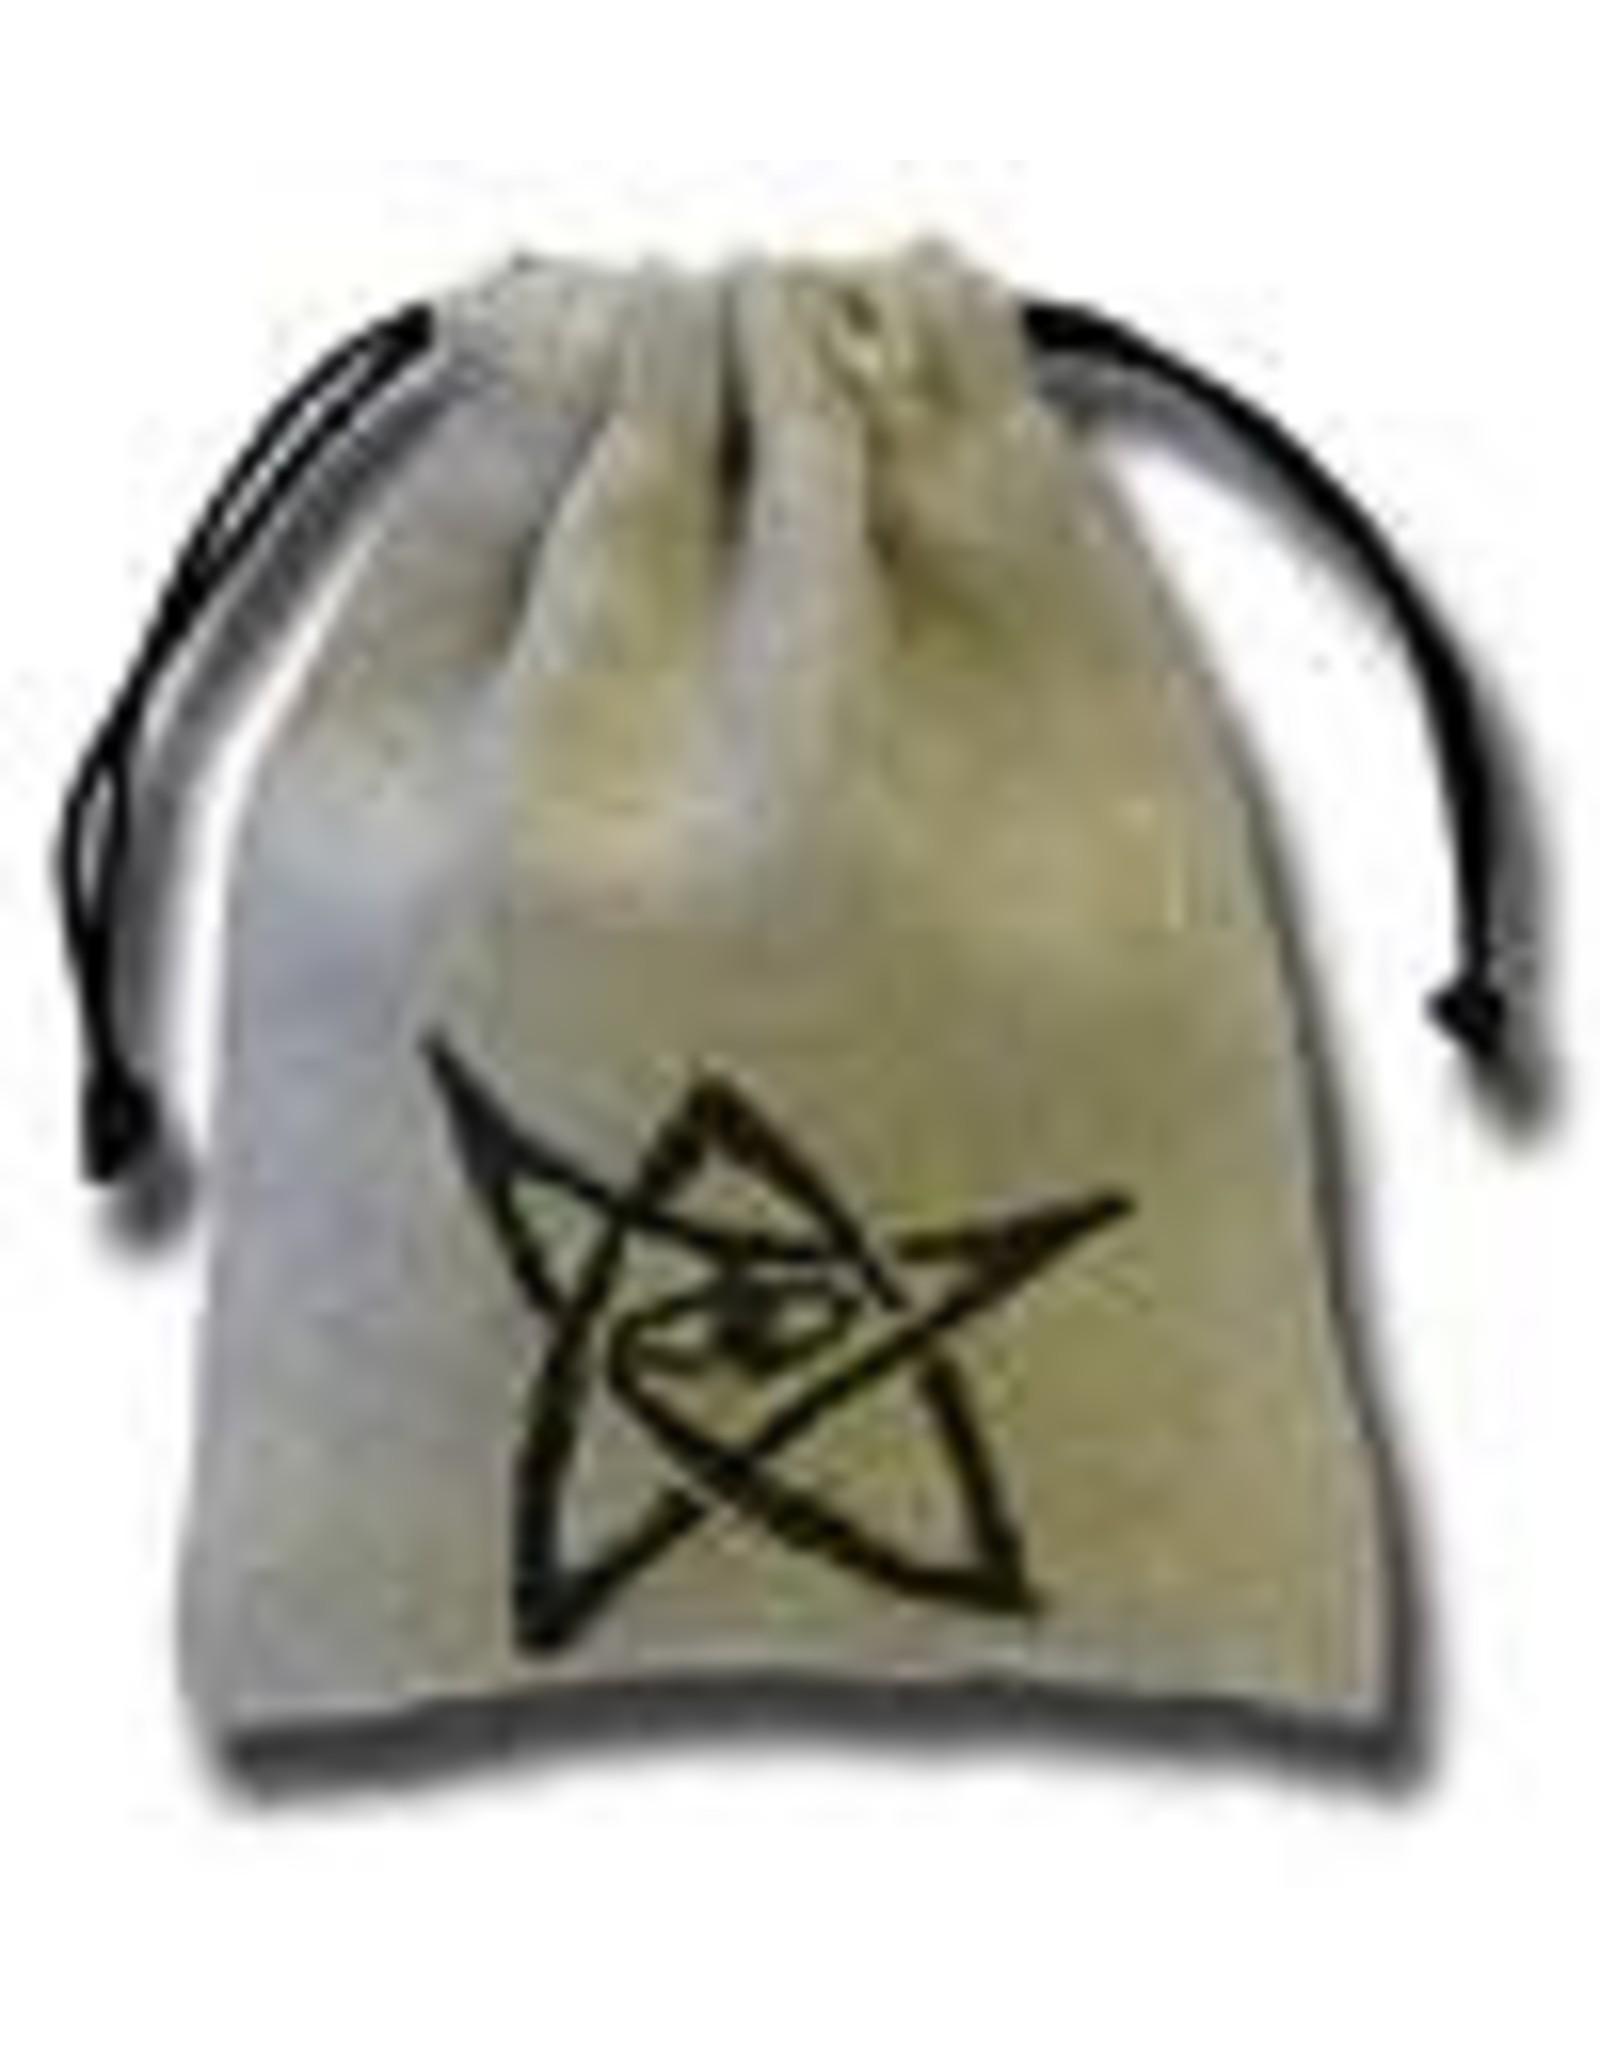 Q Workshop Dice Bag: Call of Cthulhu